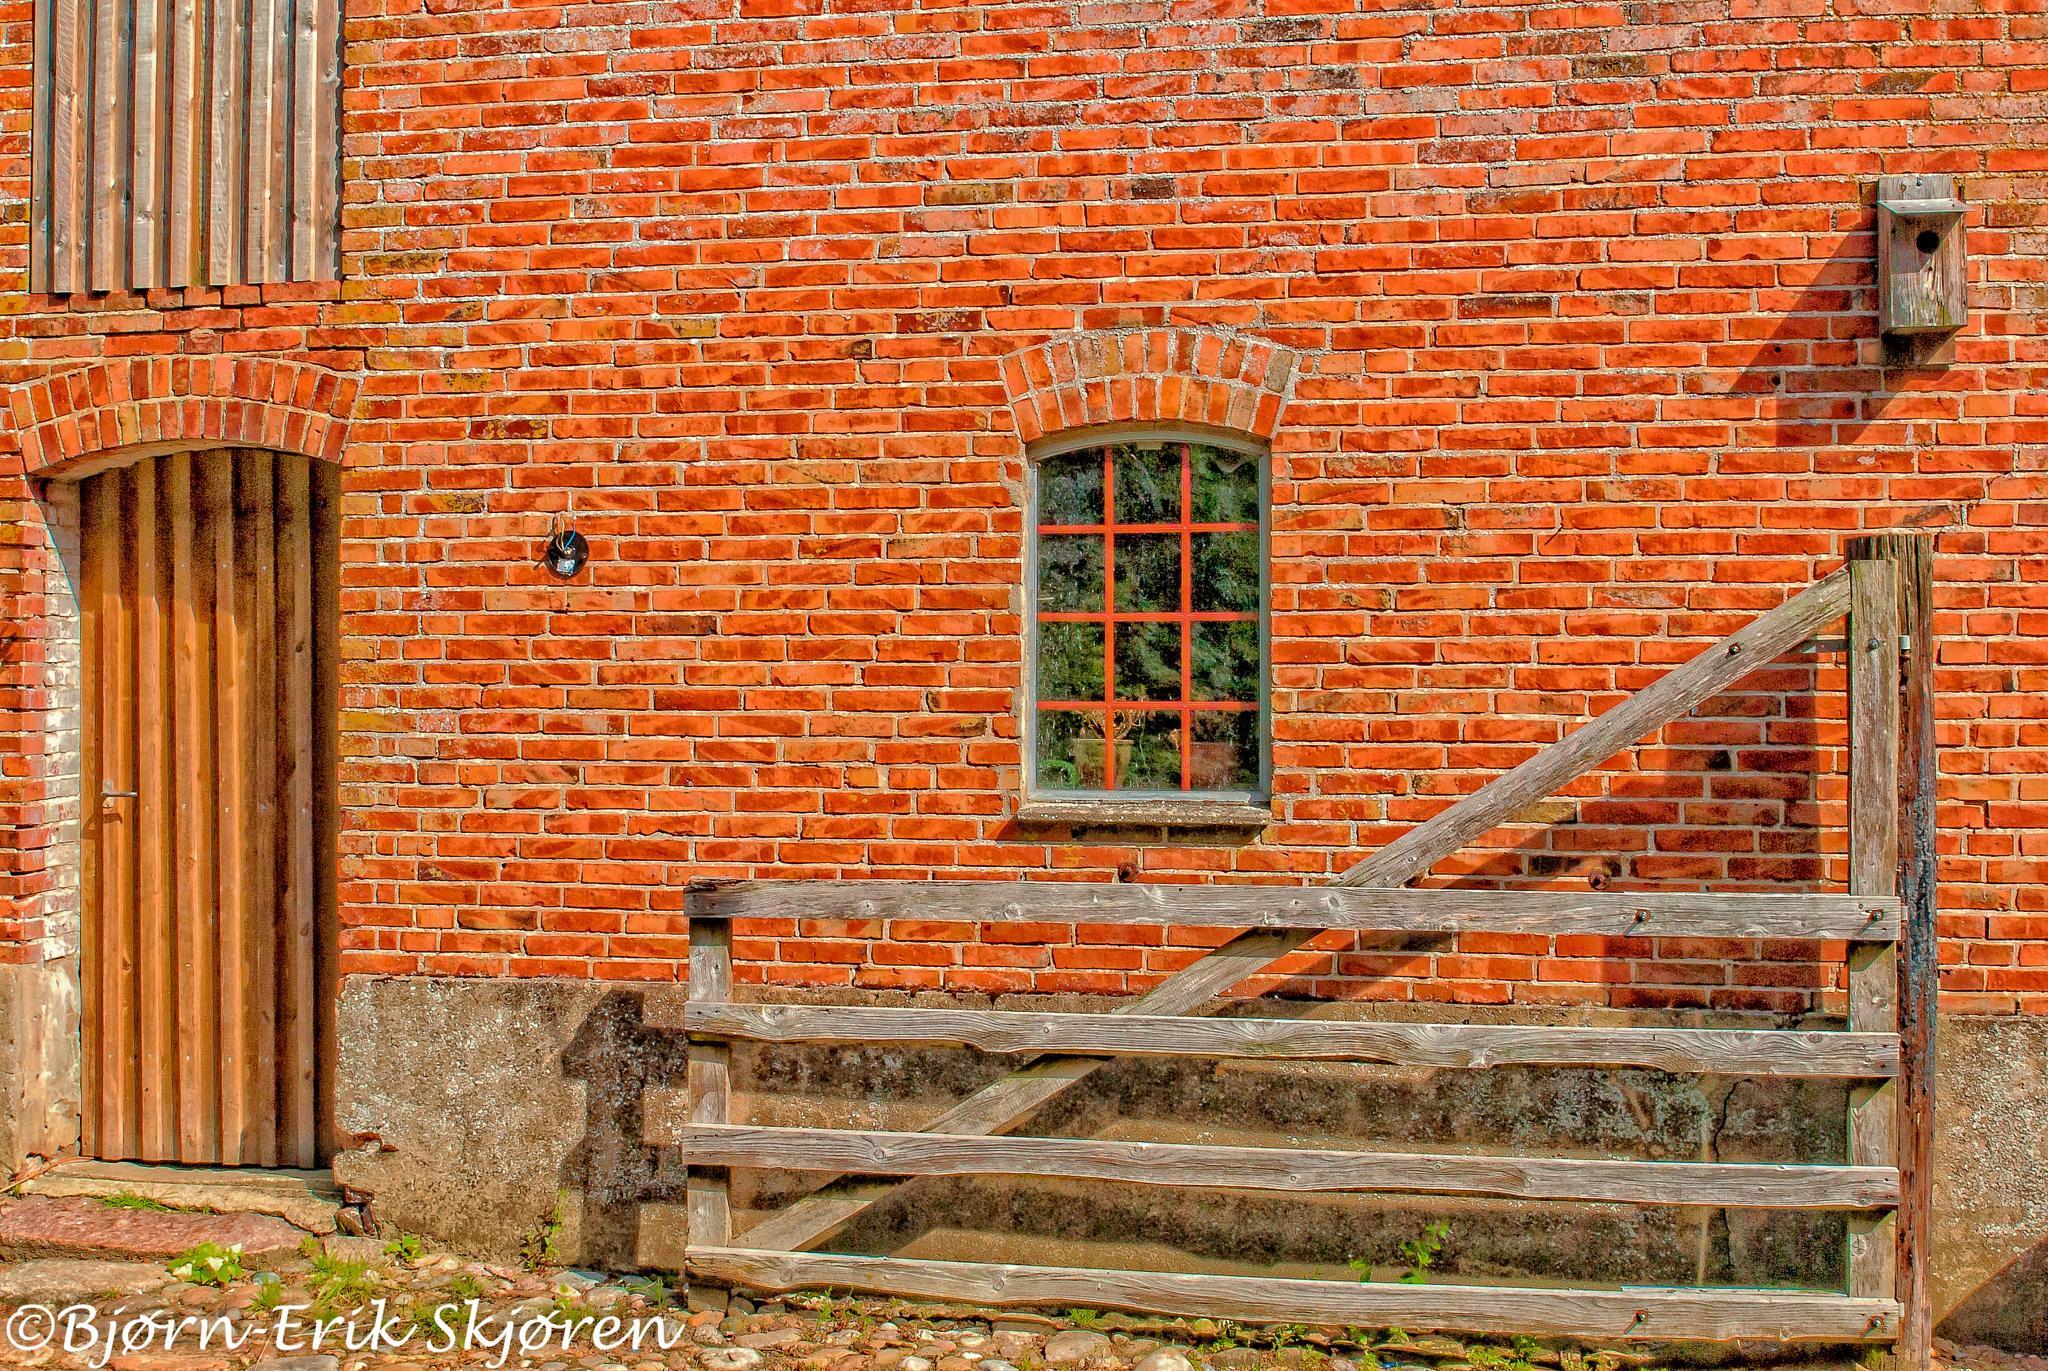 Danish farmhouse by Bjørn-Erik Skjøren